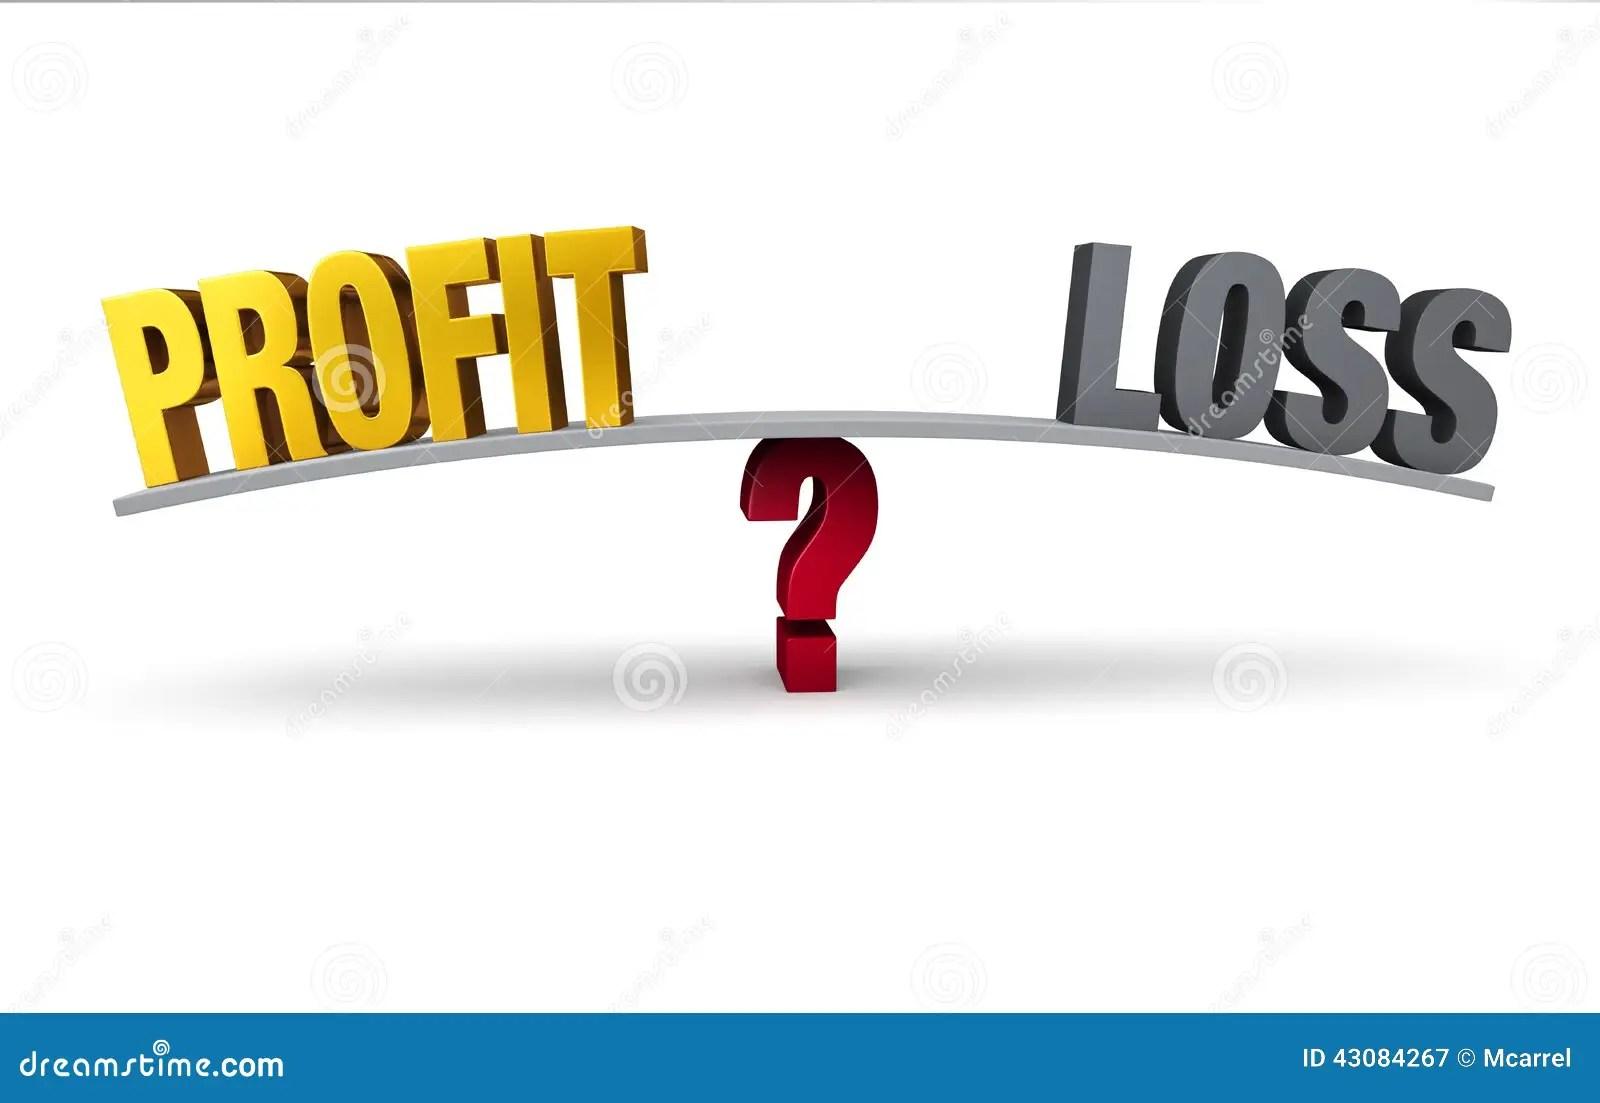 Profit Or Loss? stock illustration. Illustration of balance - 43084267